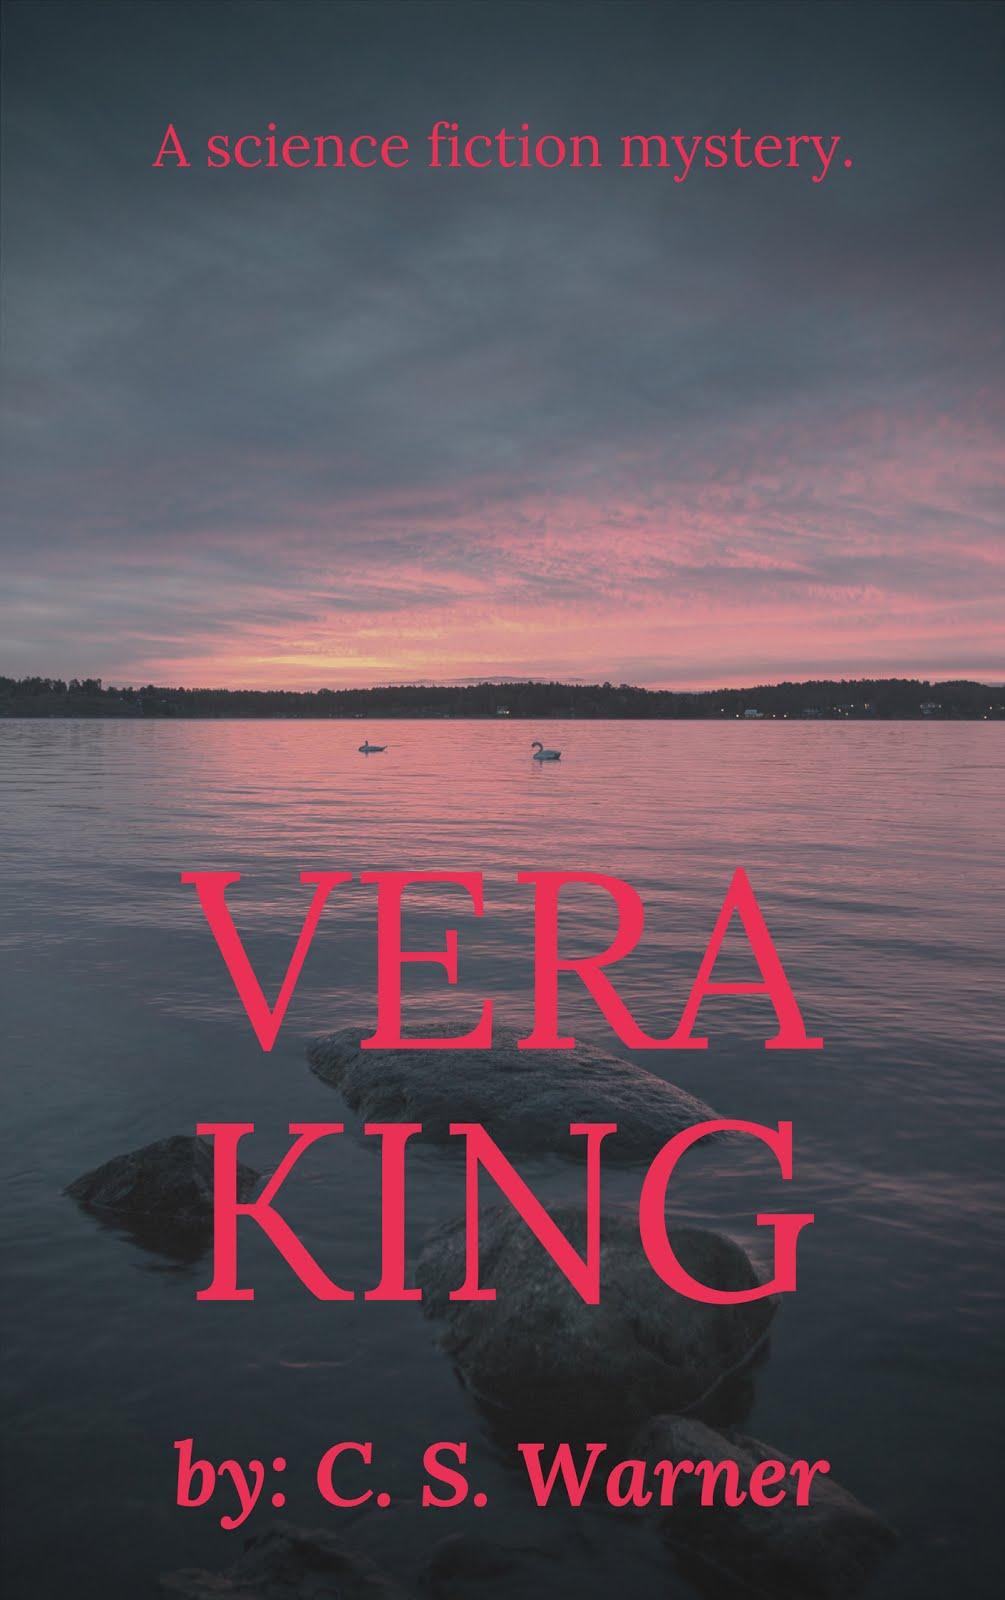 Vera King